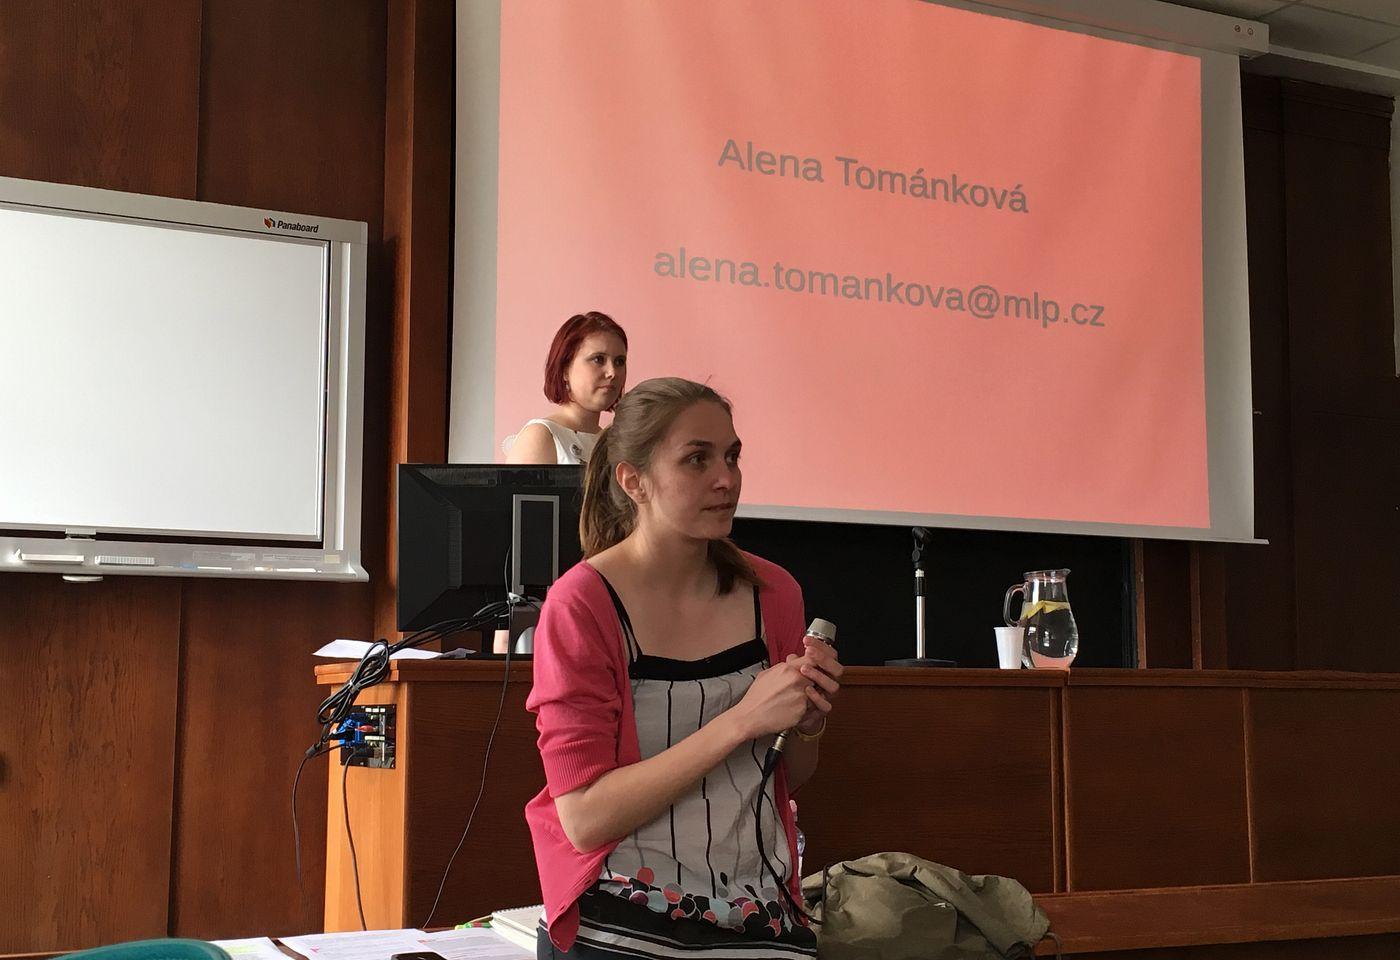 Alena Tománková